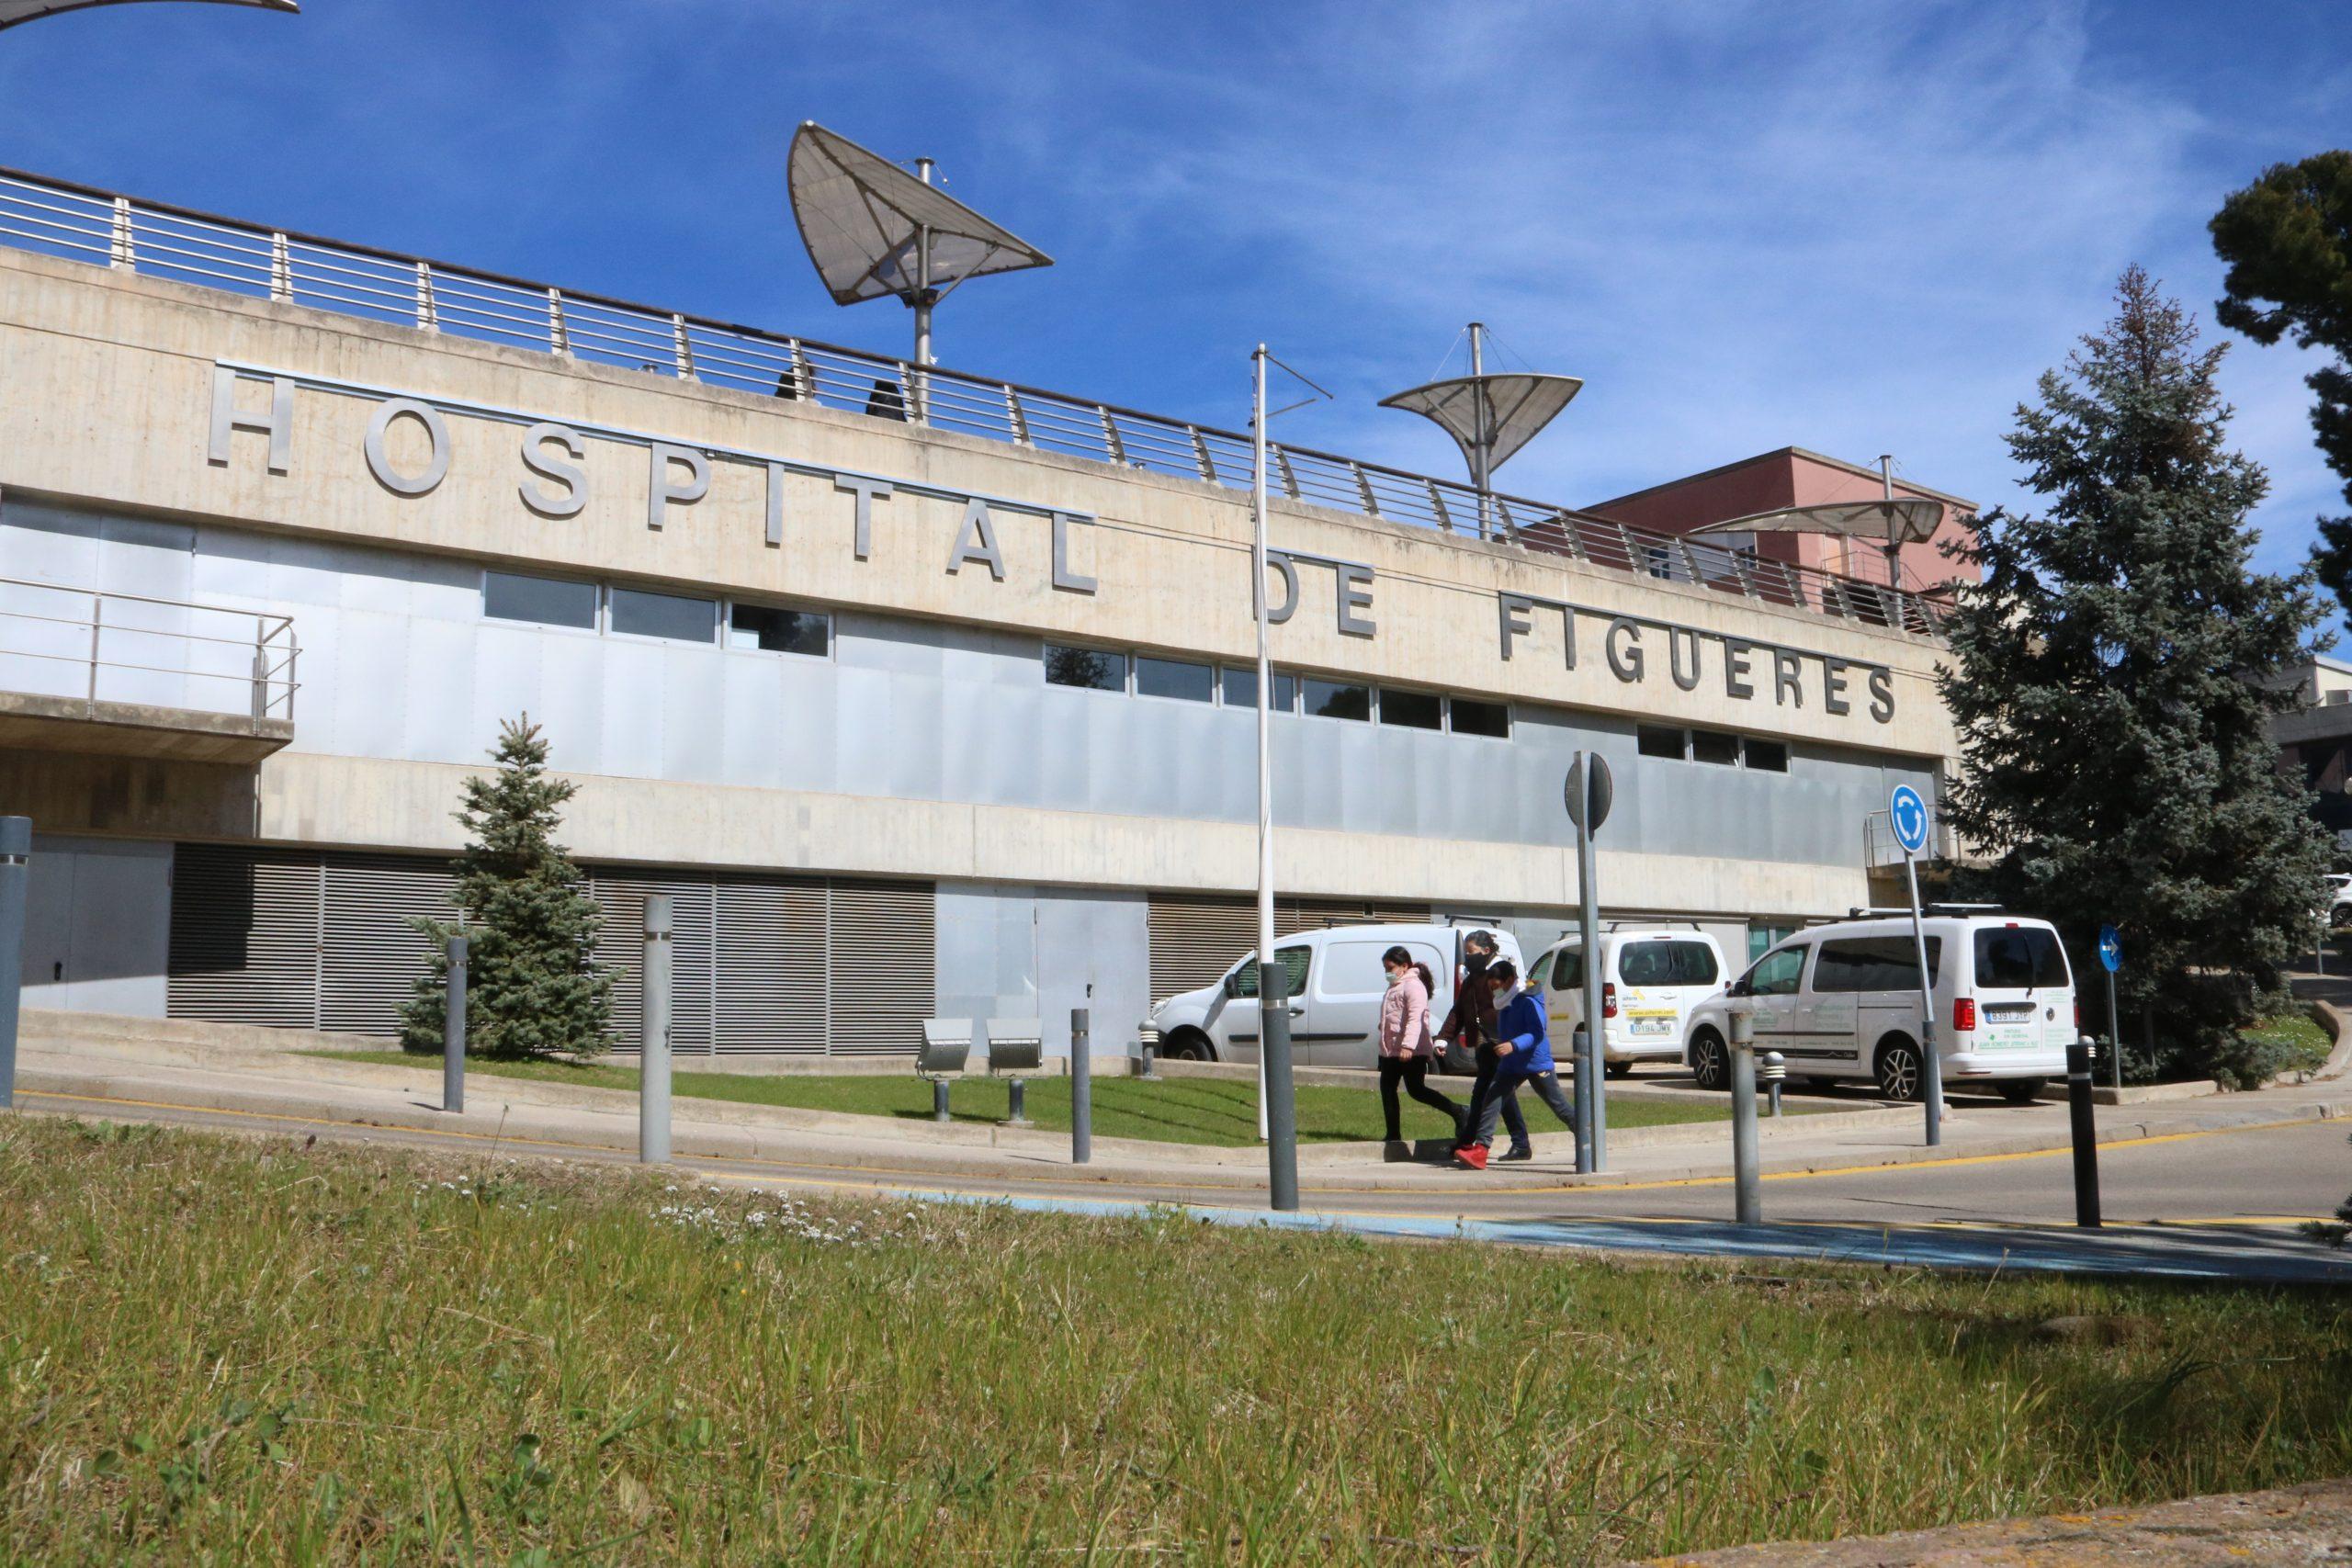 La façana de l'hospital de Figueres | ACN